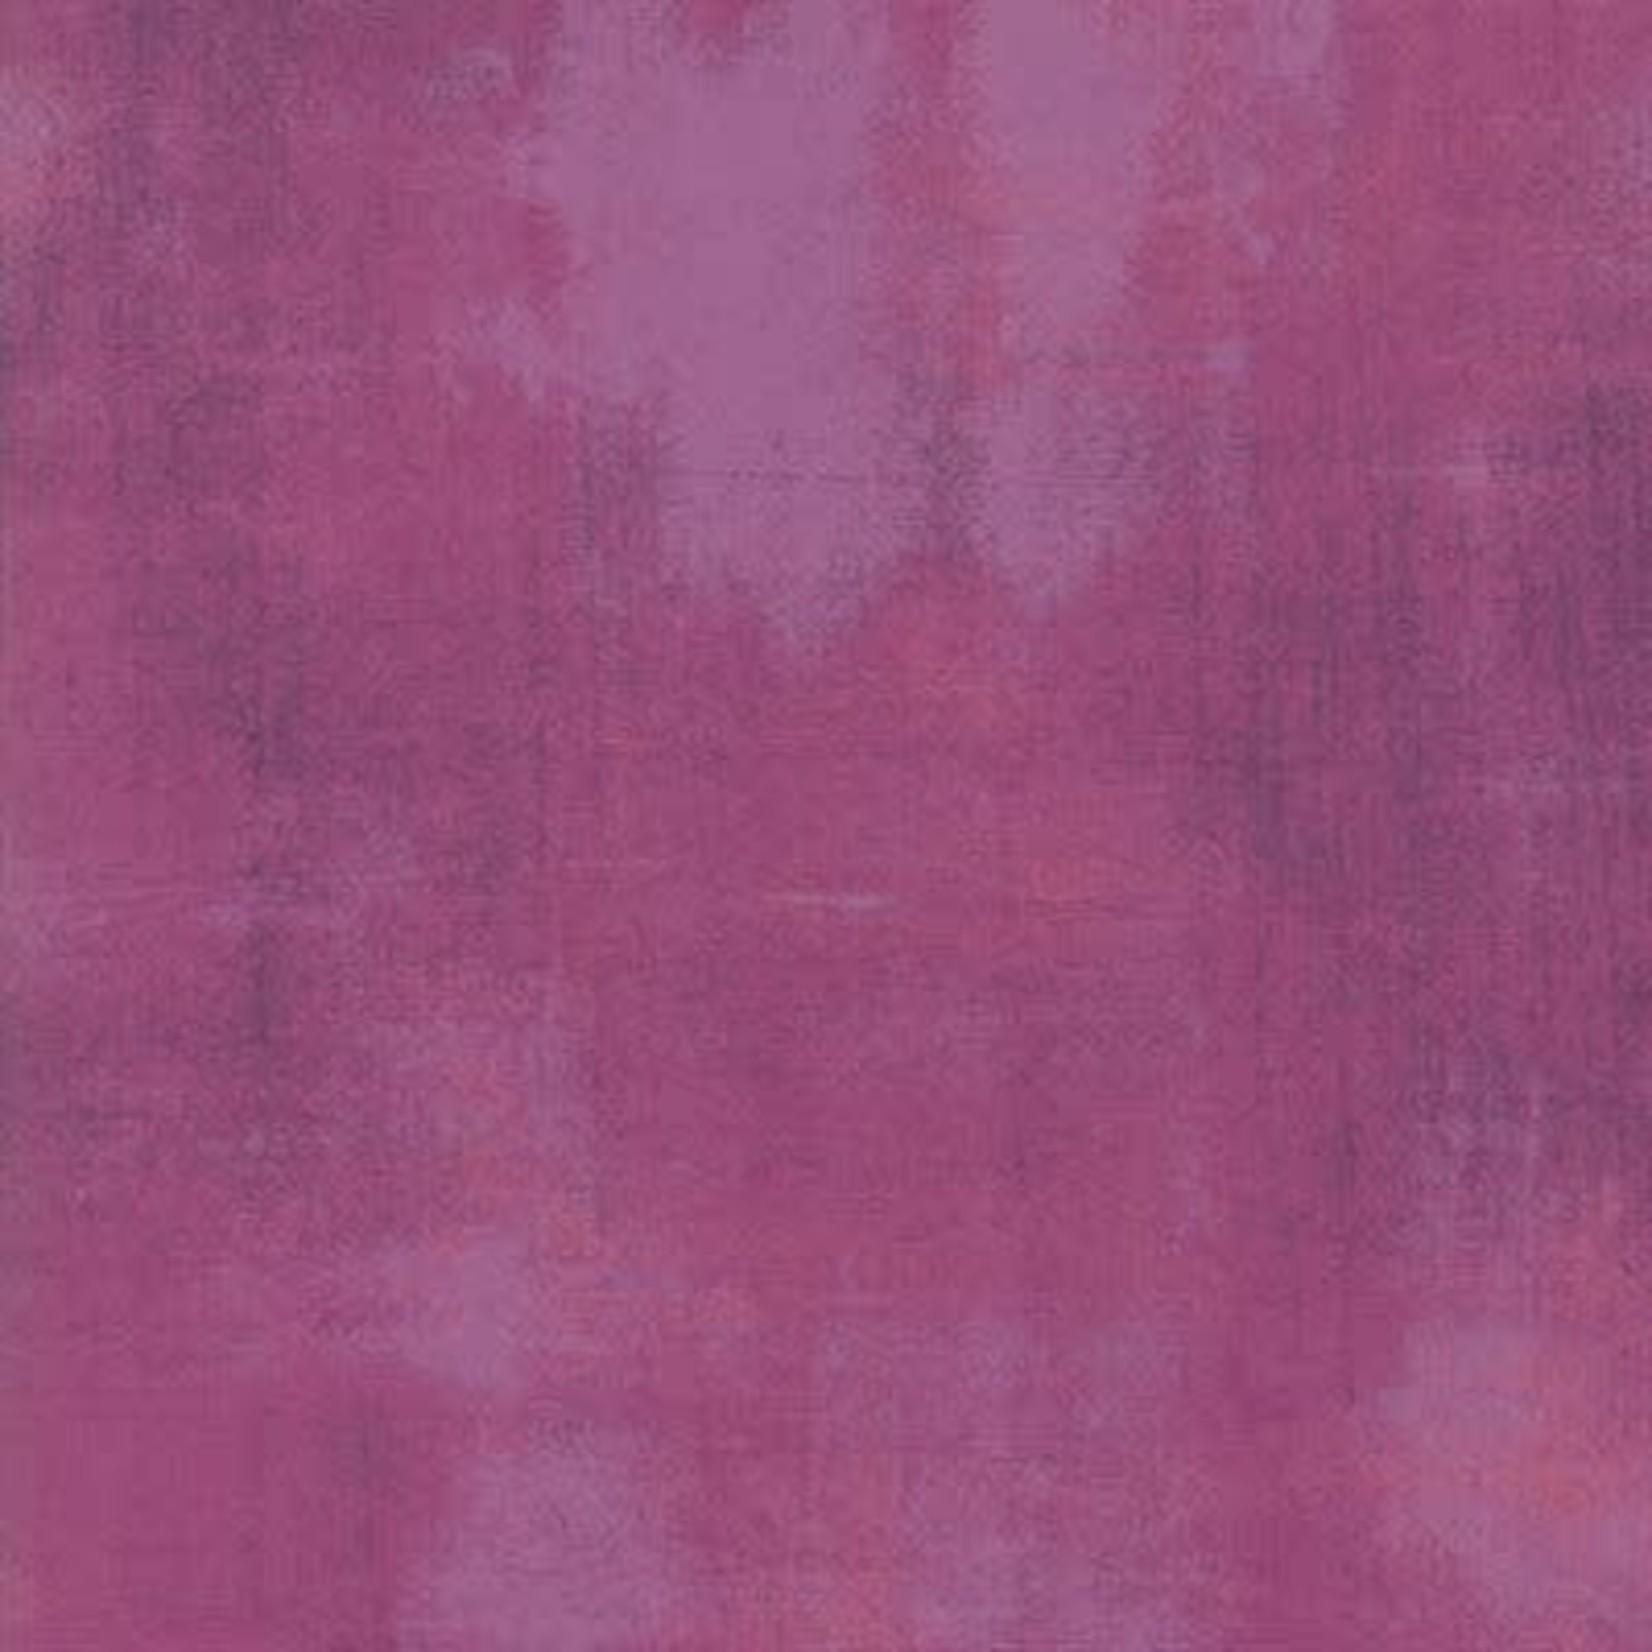 Moda GRUNGE BASICS Grunge - Berry Pie per cm or $20/m